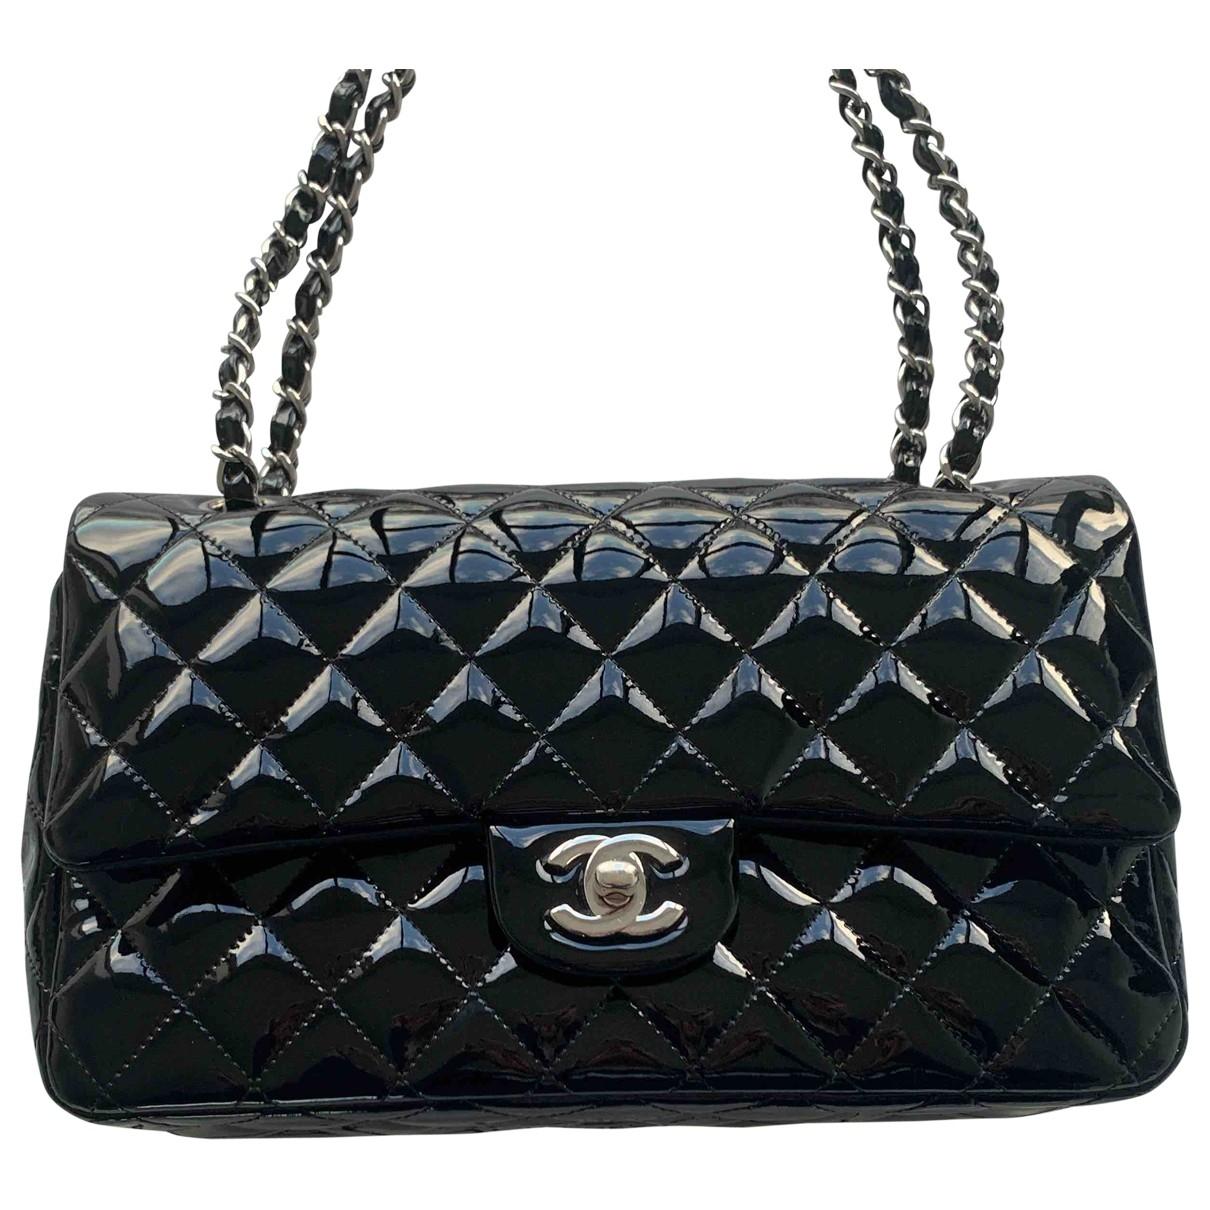 Chanel Timeless/Classique Black Patent leather handbag for Women \N